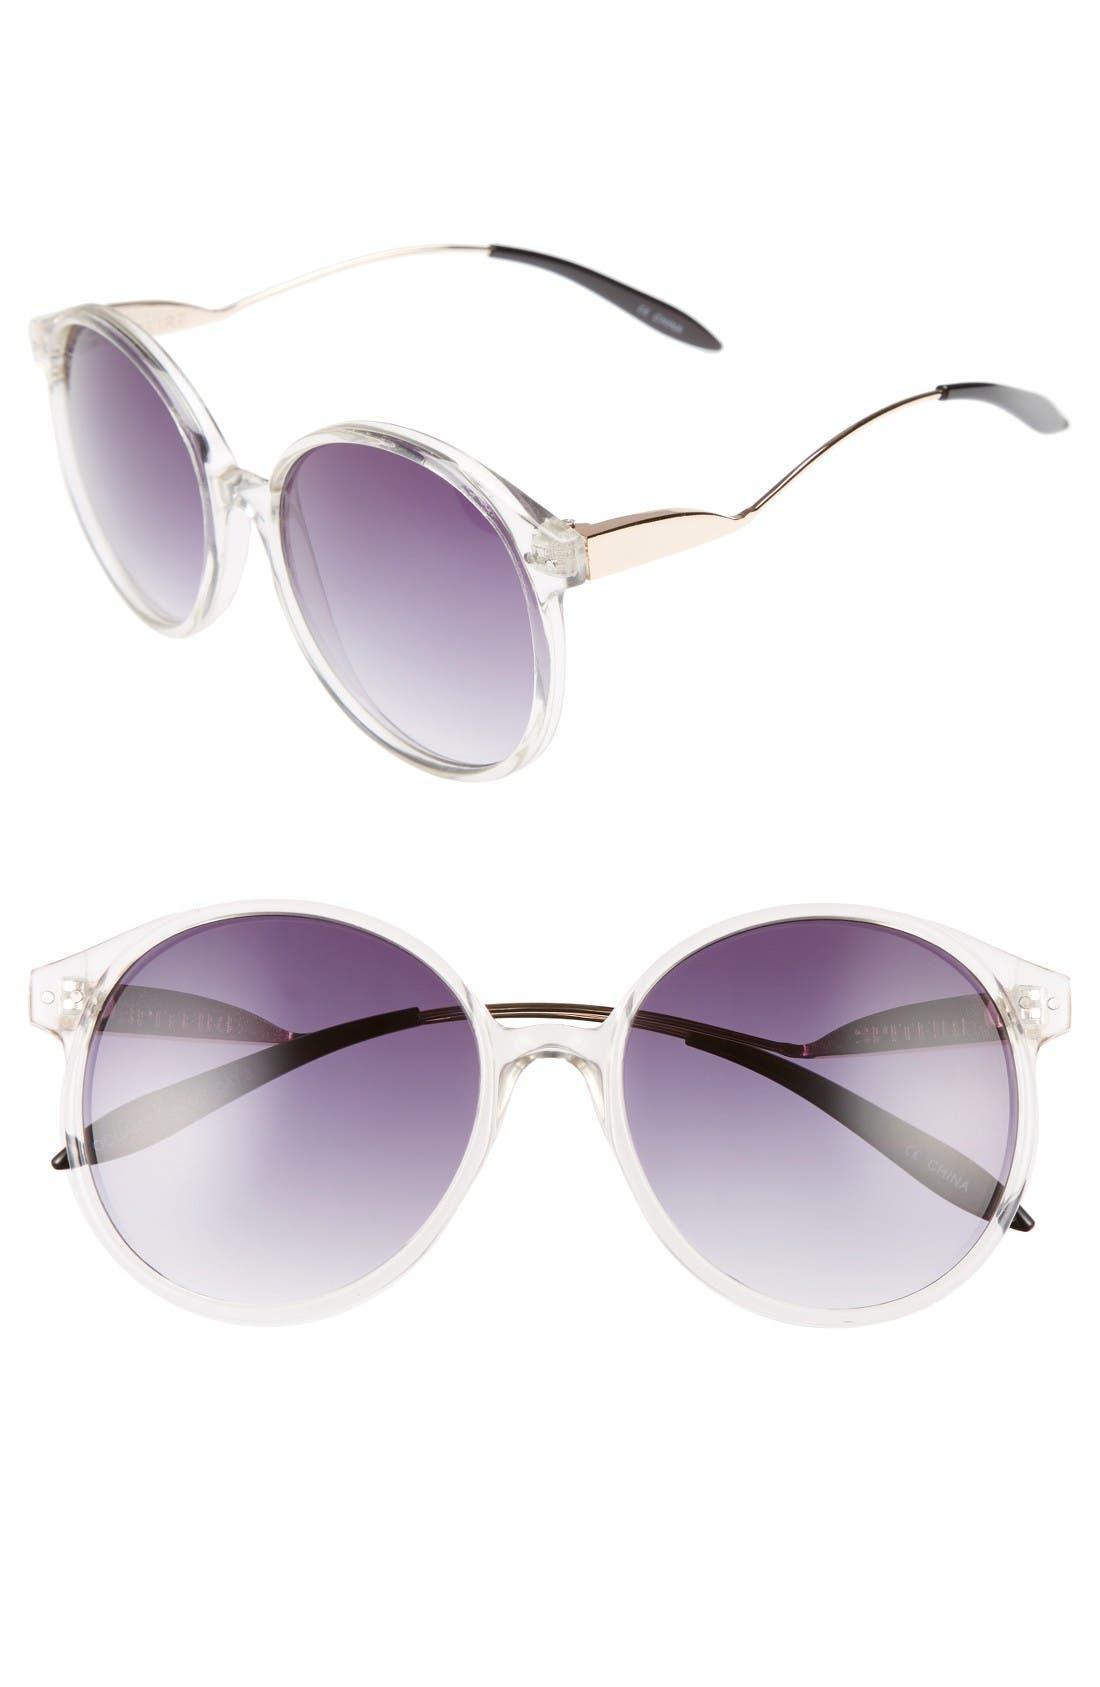 Spitfire Occam's Razor Sunglasses